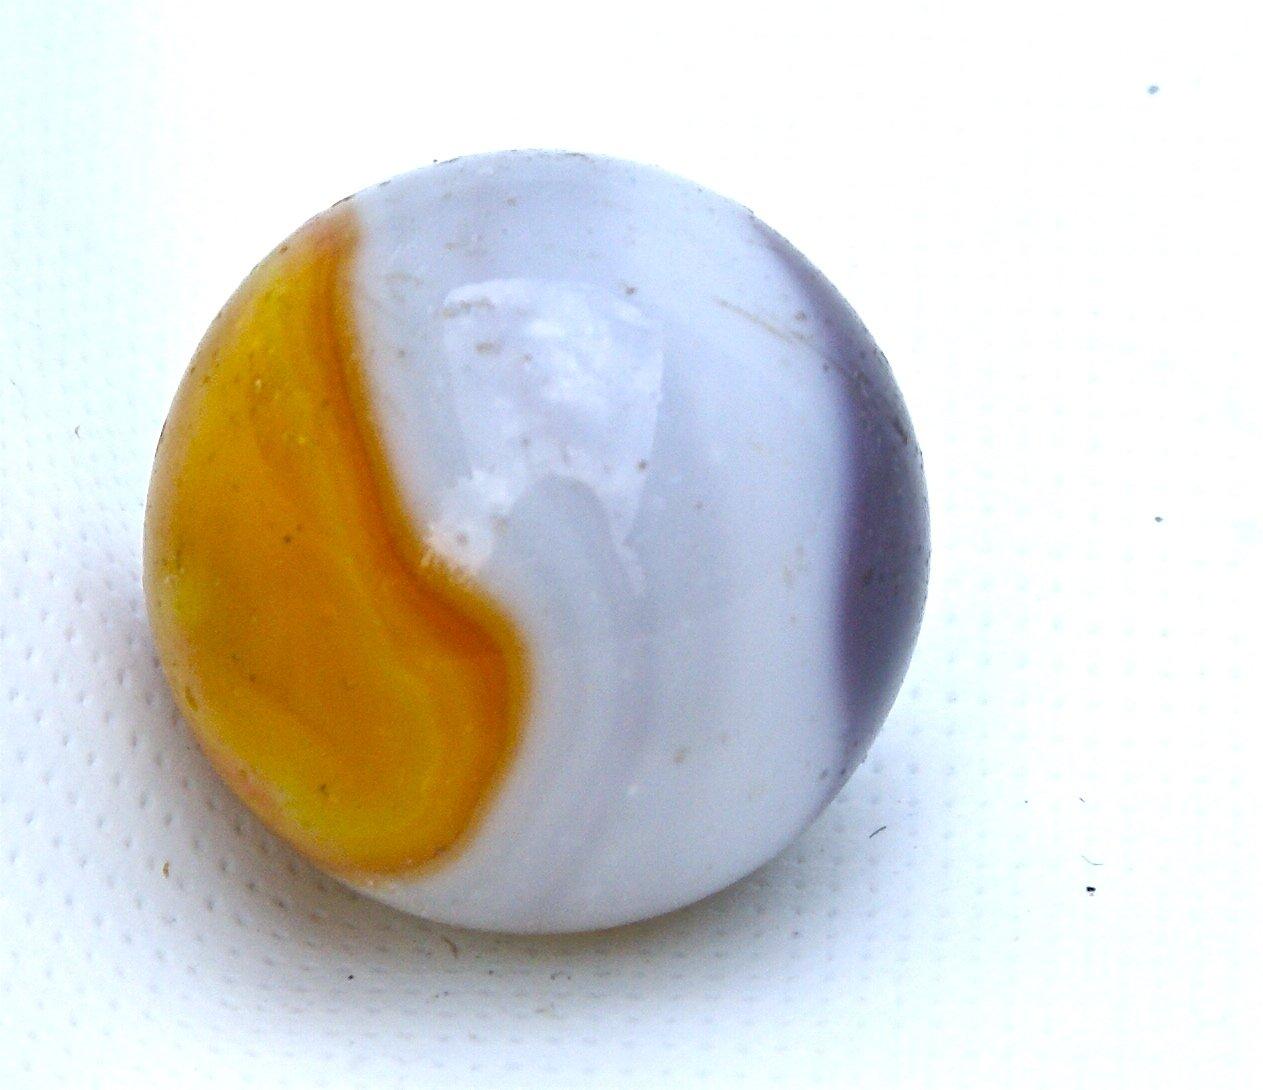 Vintage Akro Agate Shooter Marble Purple, Egg Yolk & White